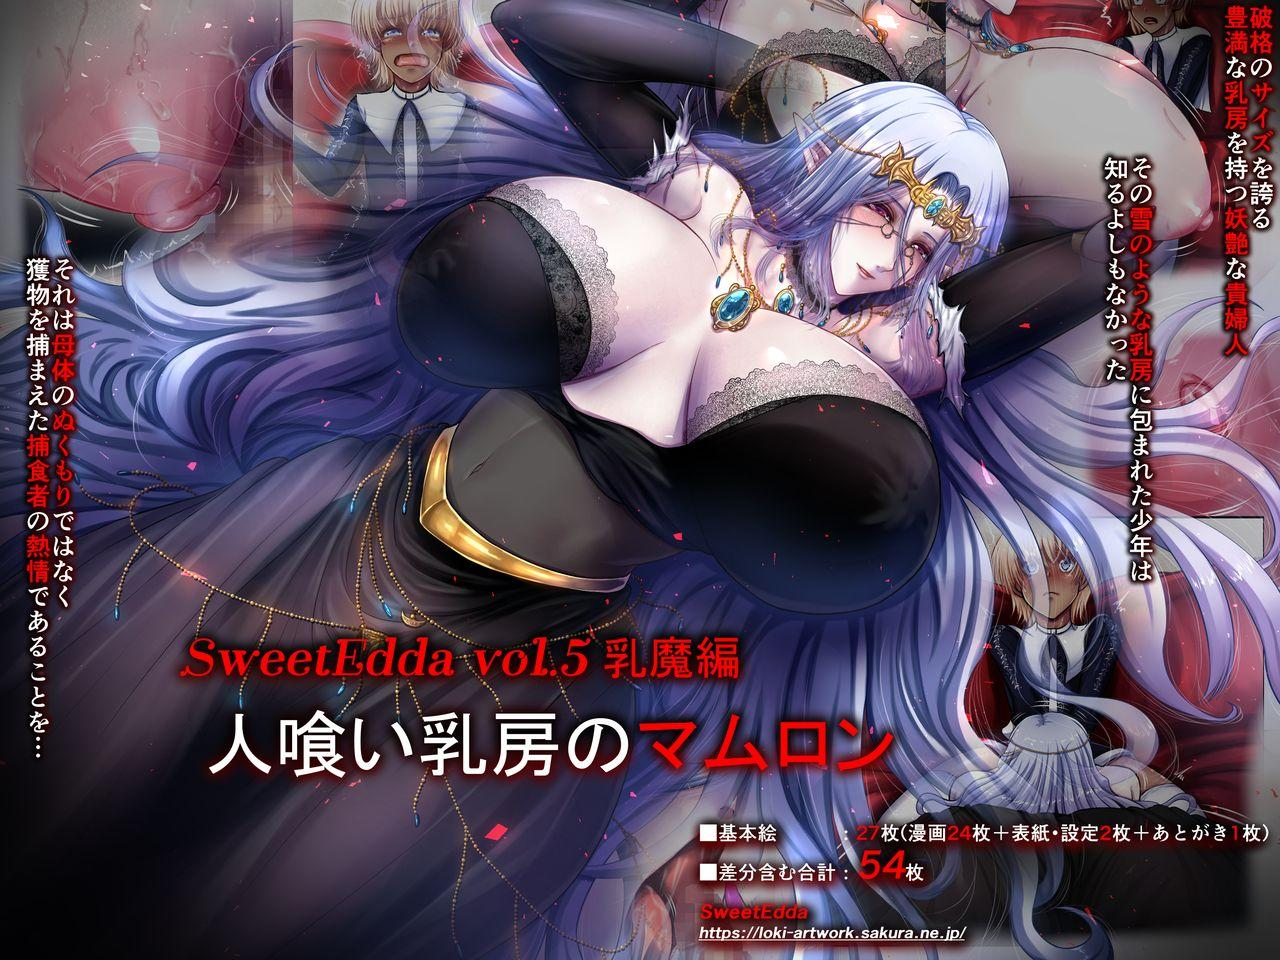 SweetEdda vol. 5 Nyuuma Hen Hitokui Chibusa no Mamelon 0